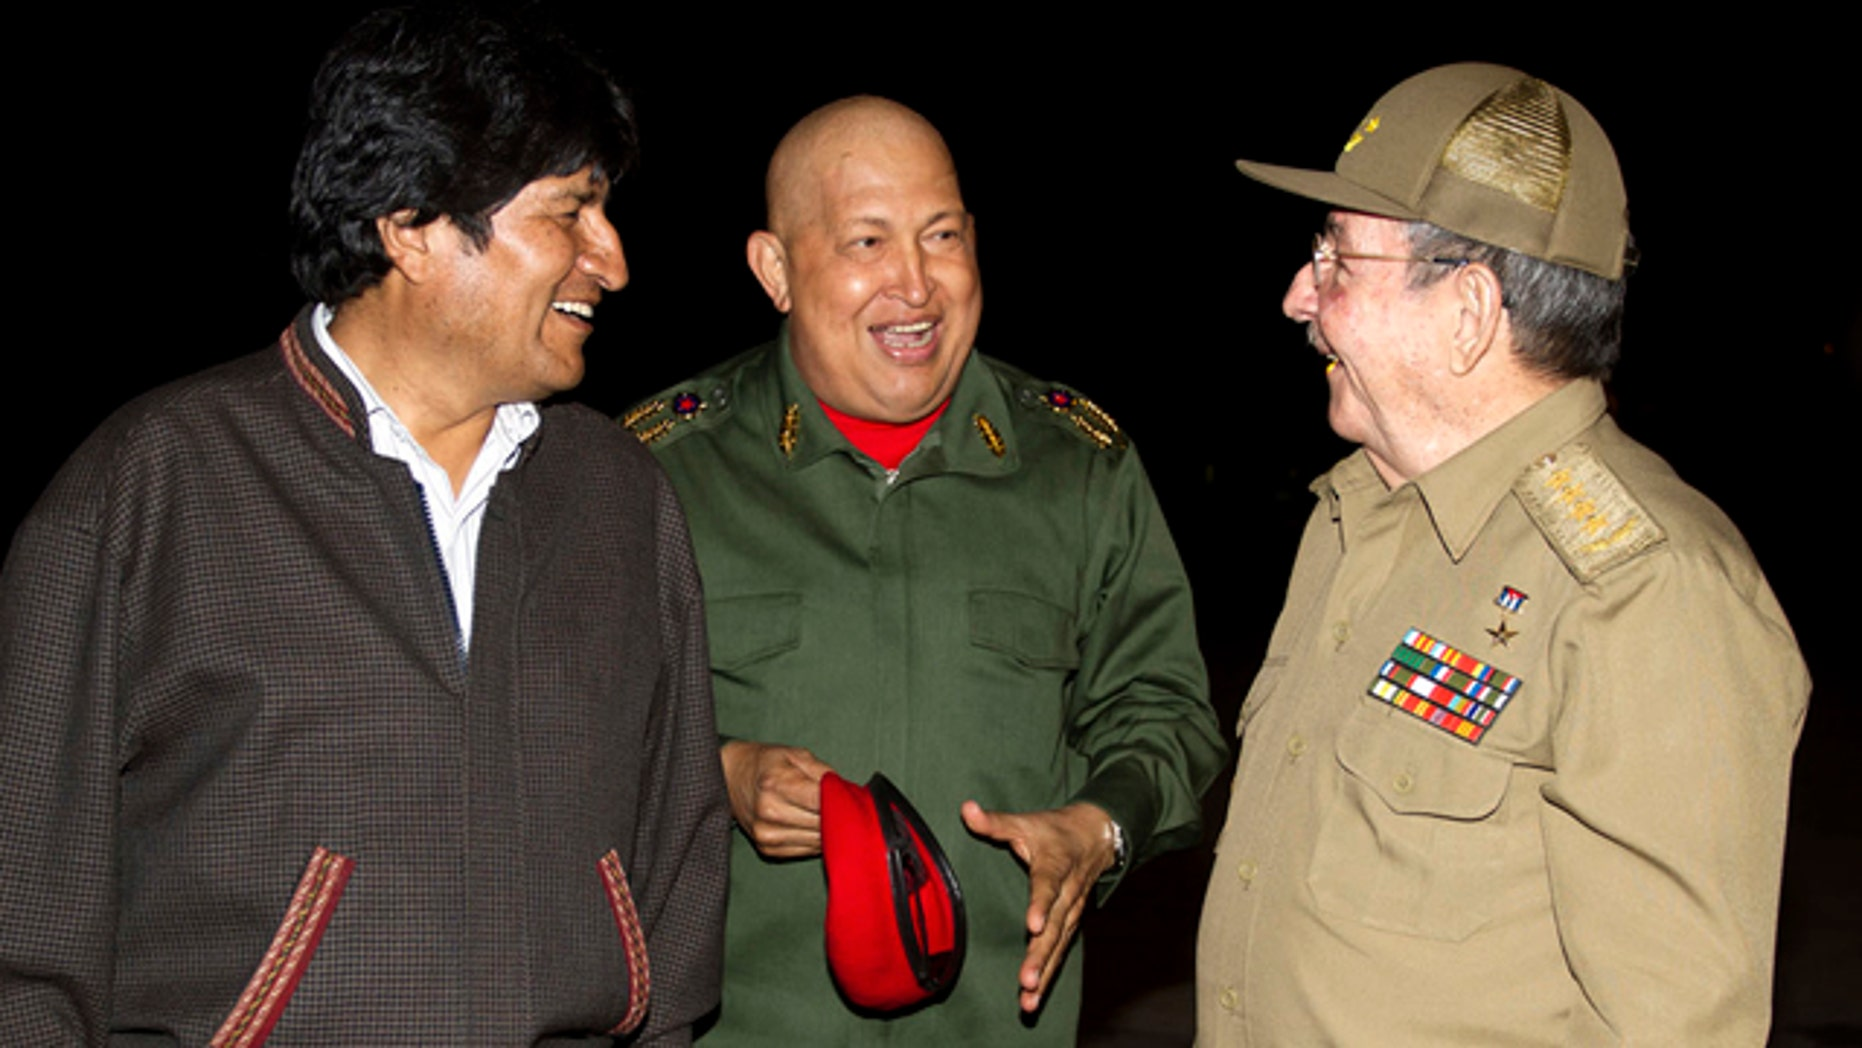 Sept. 18: Latin America  leaders, from left, Bolivia's President Evo Morales, Venezuela's President Hugo Chavez and Cuba's President Raul Castro speak at the Jose Marti airport in Havana, Cuba